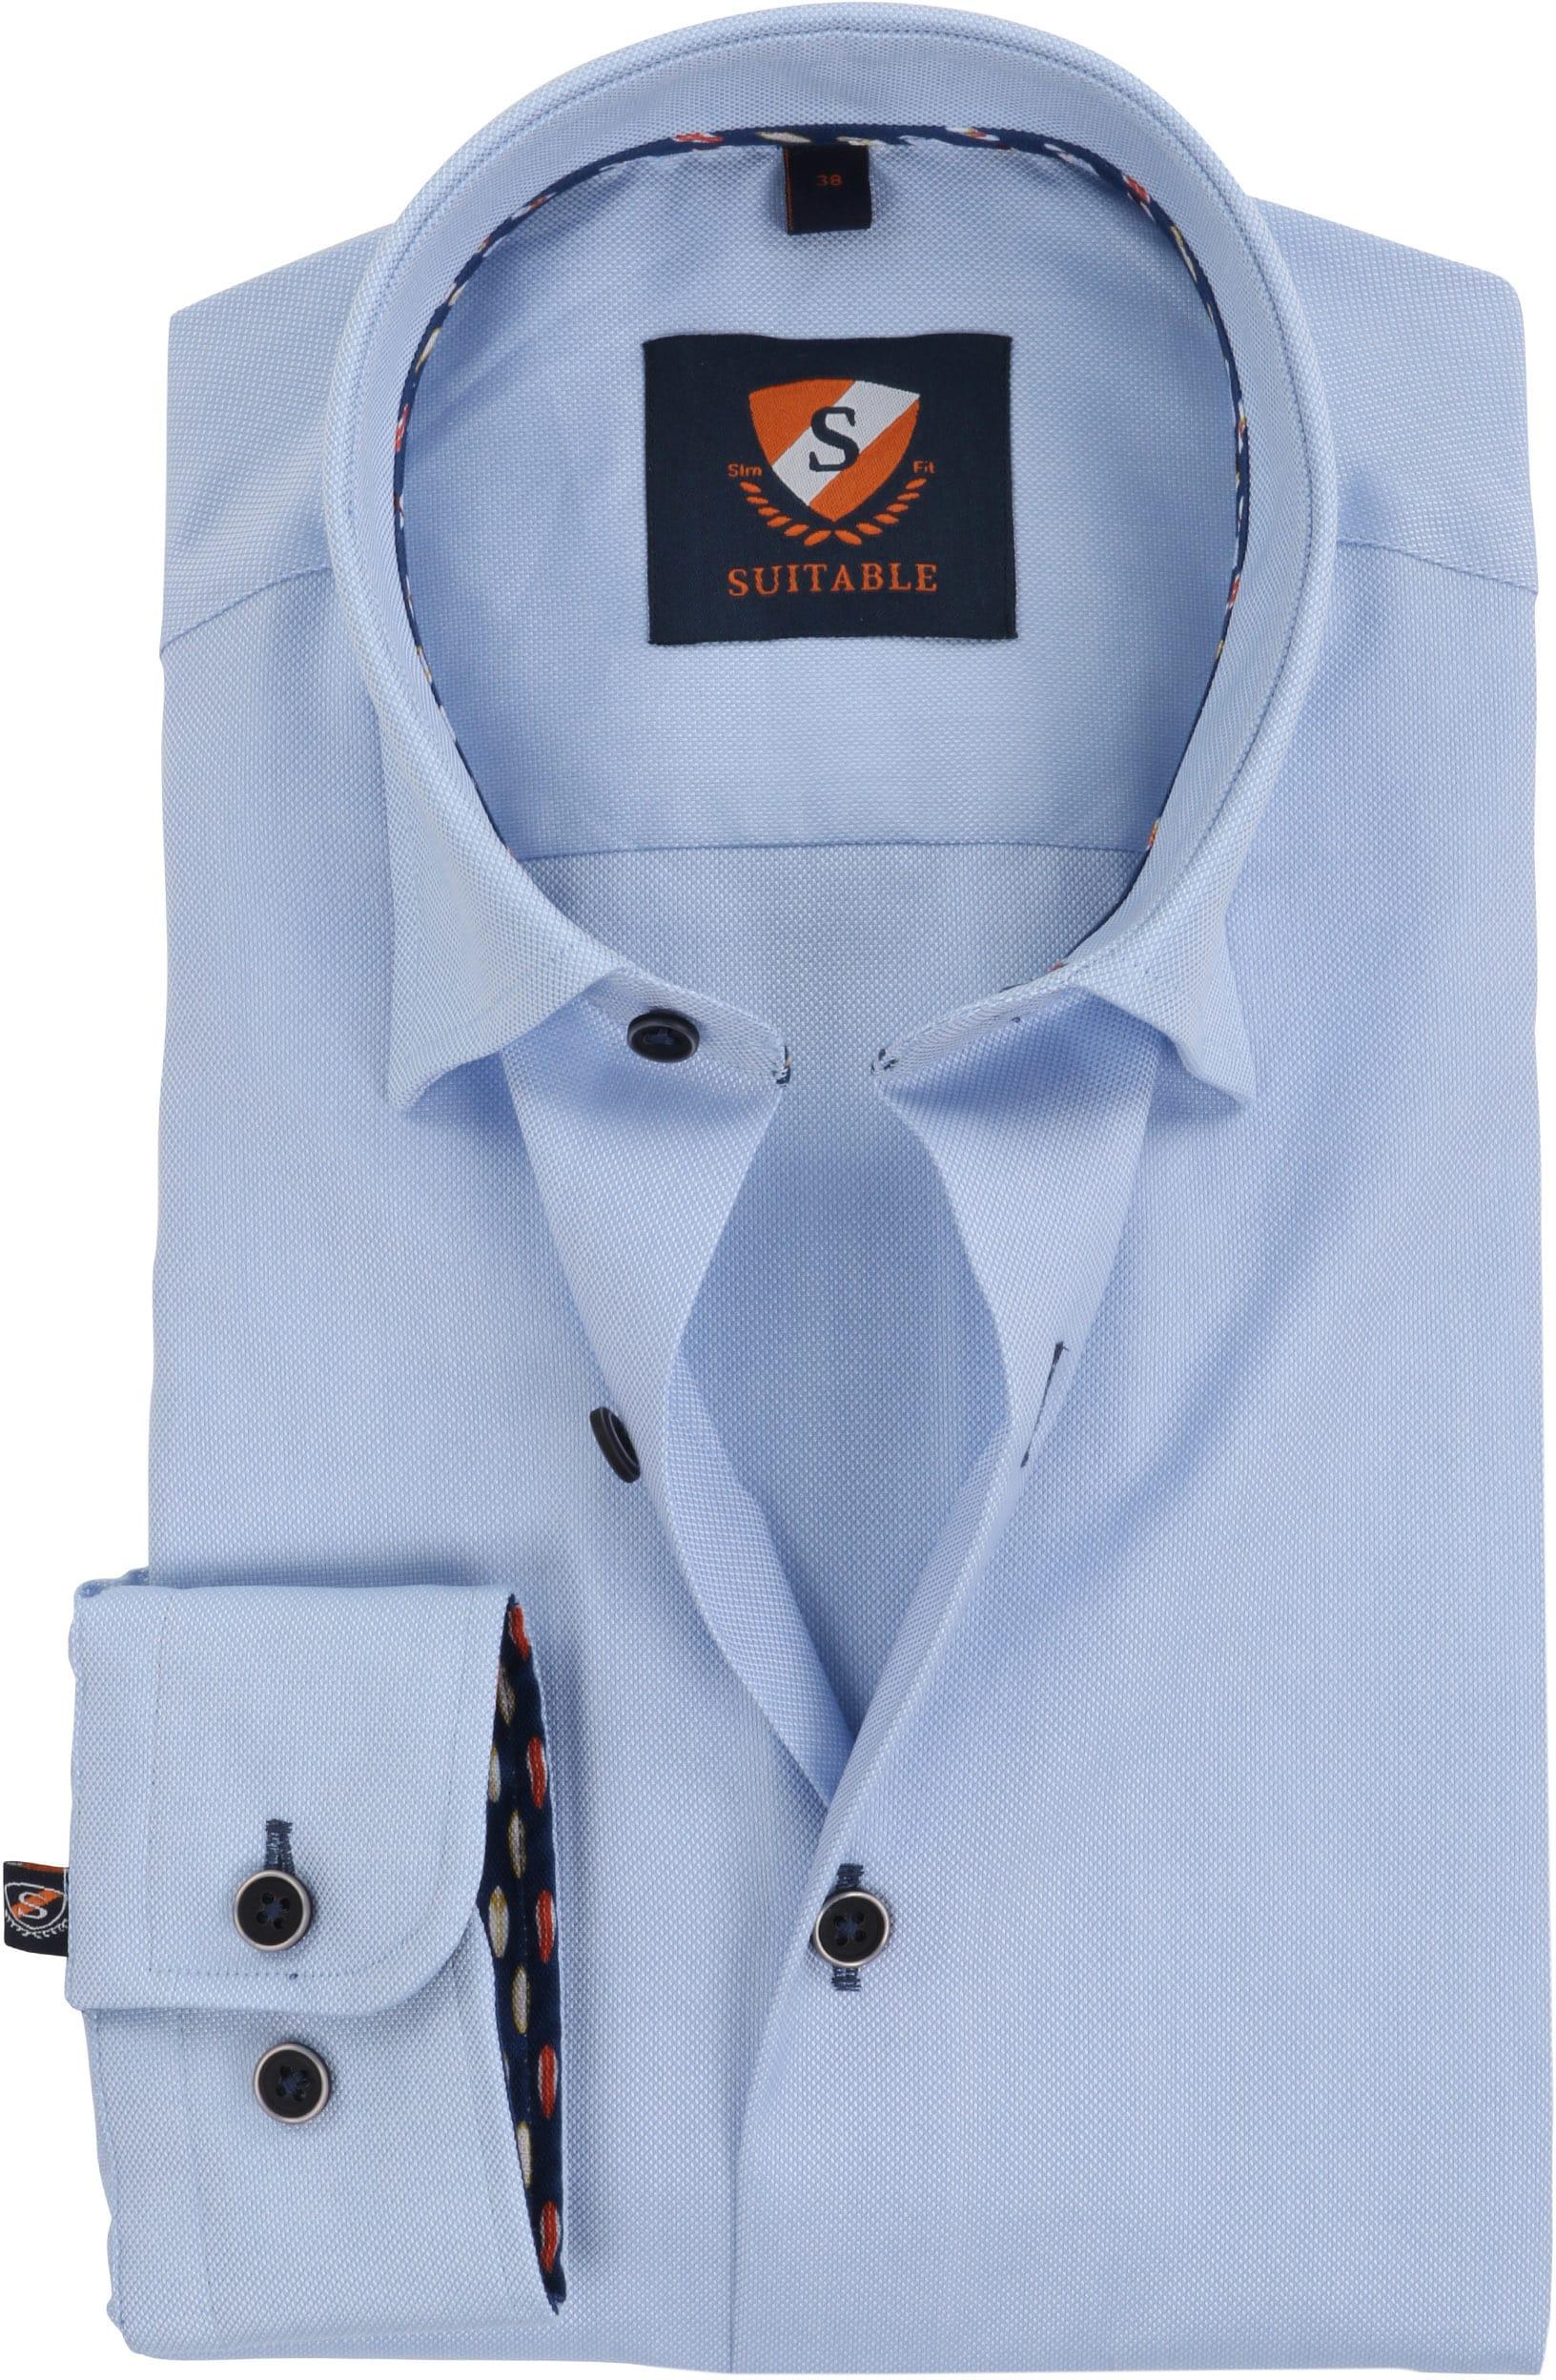 Suitable Shirt Oxford Blue SF foto 0